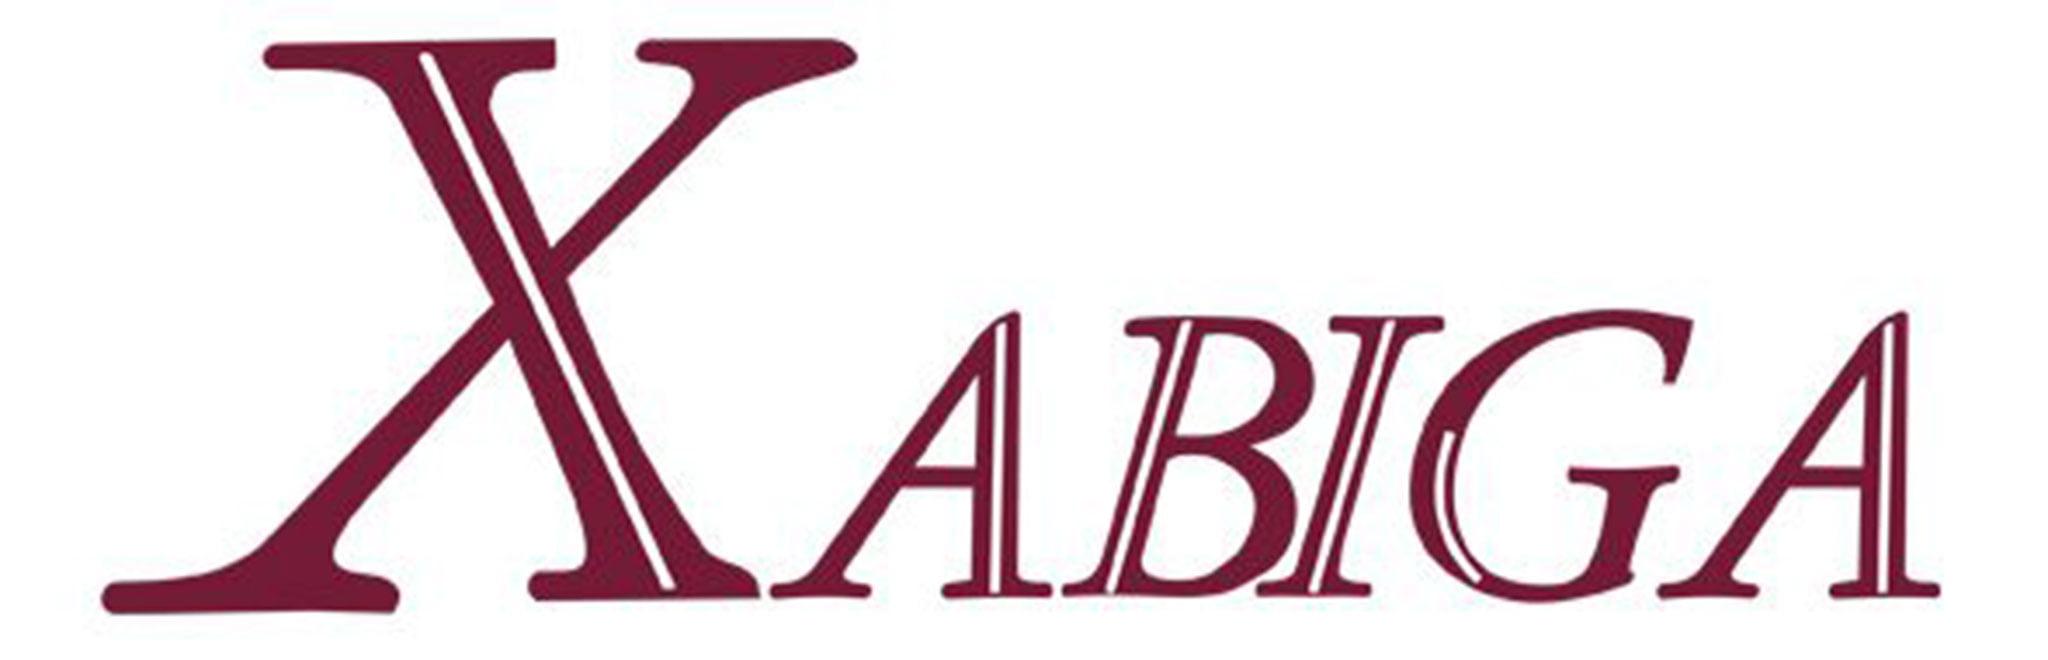 Logo Xabiga Real Estate